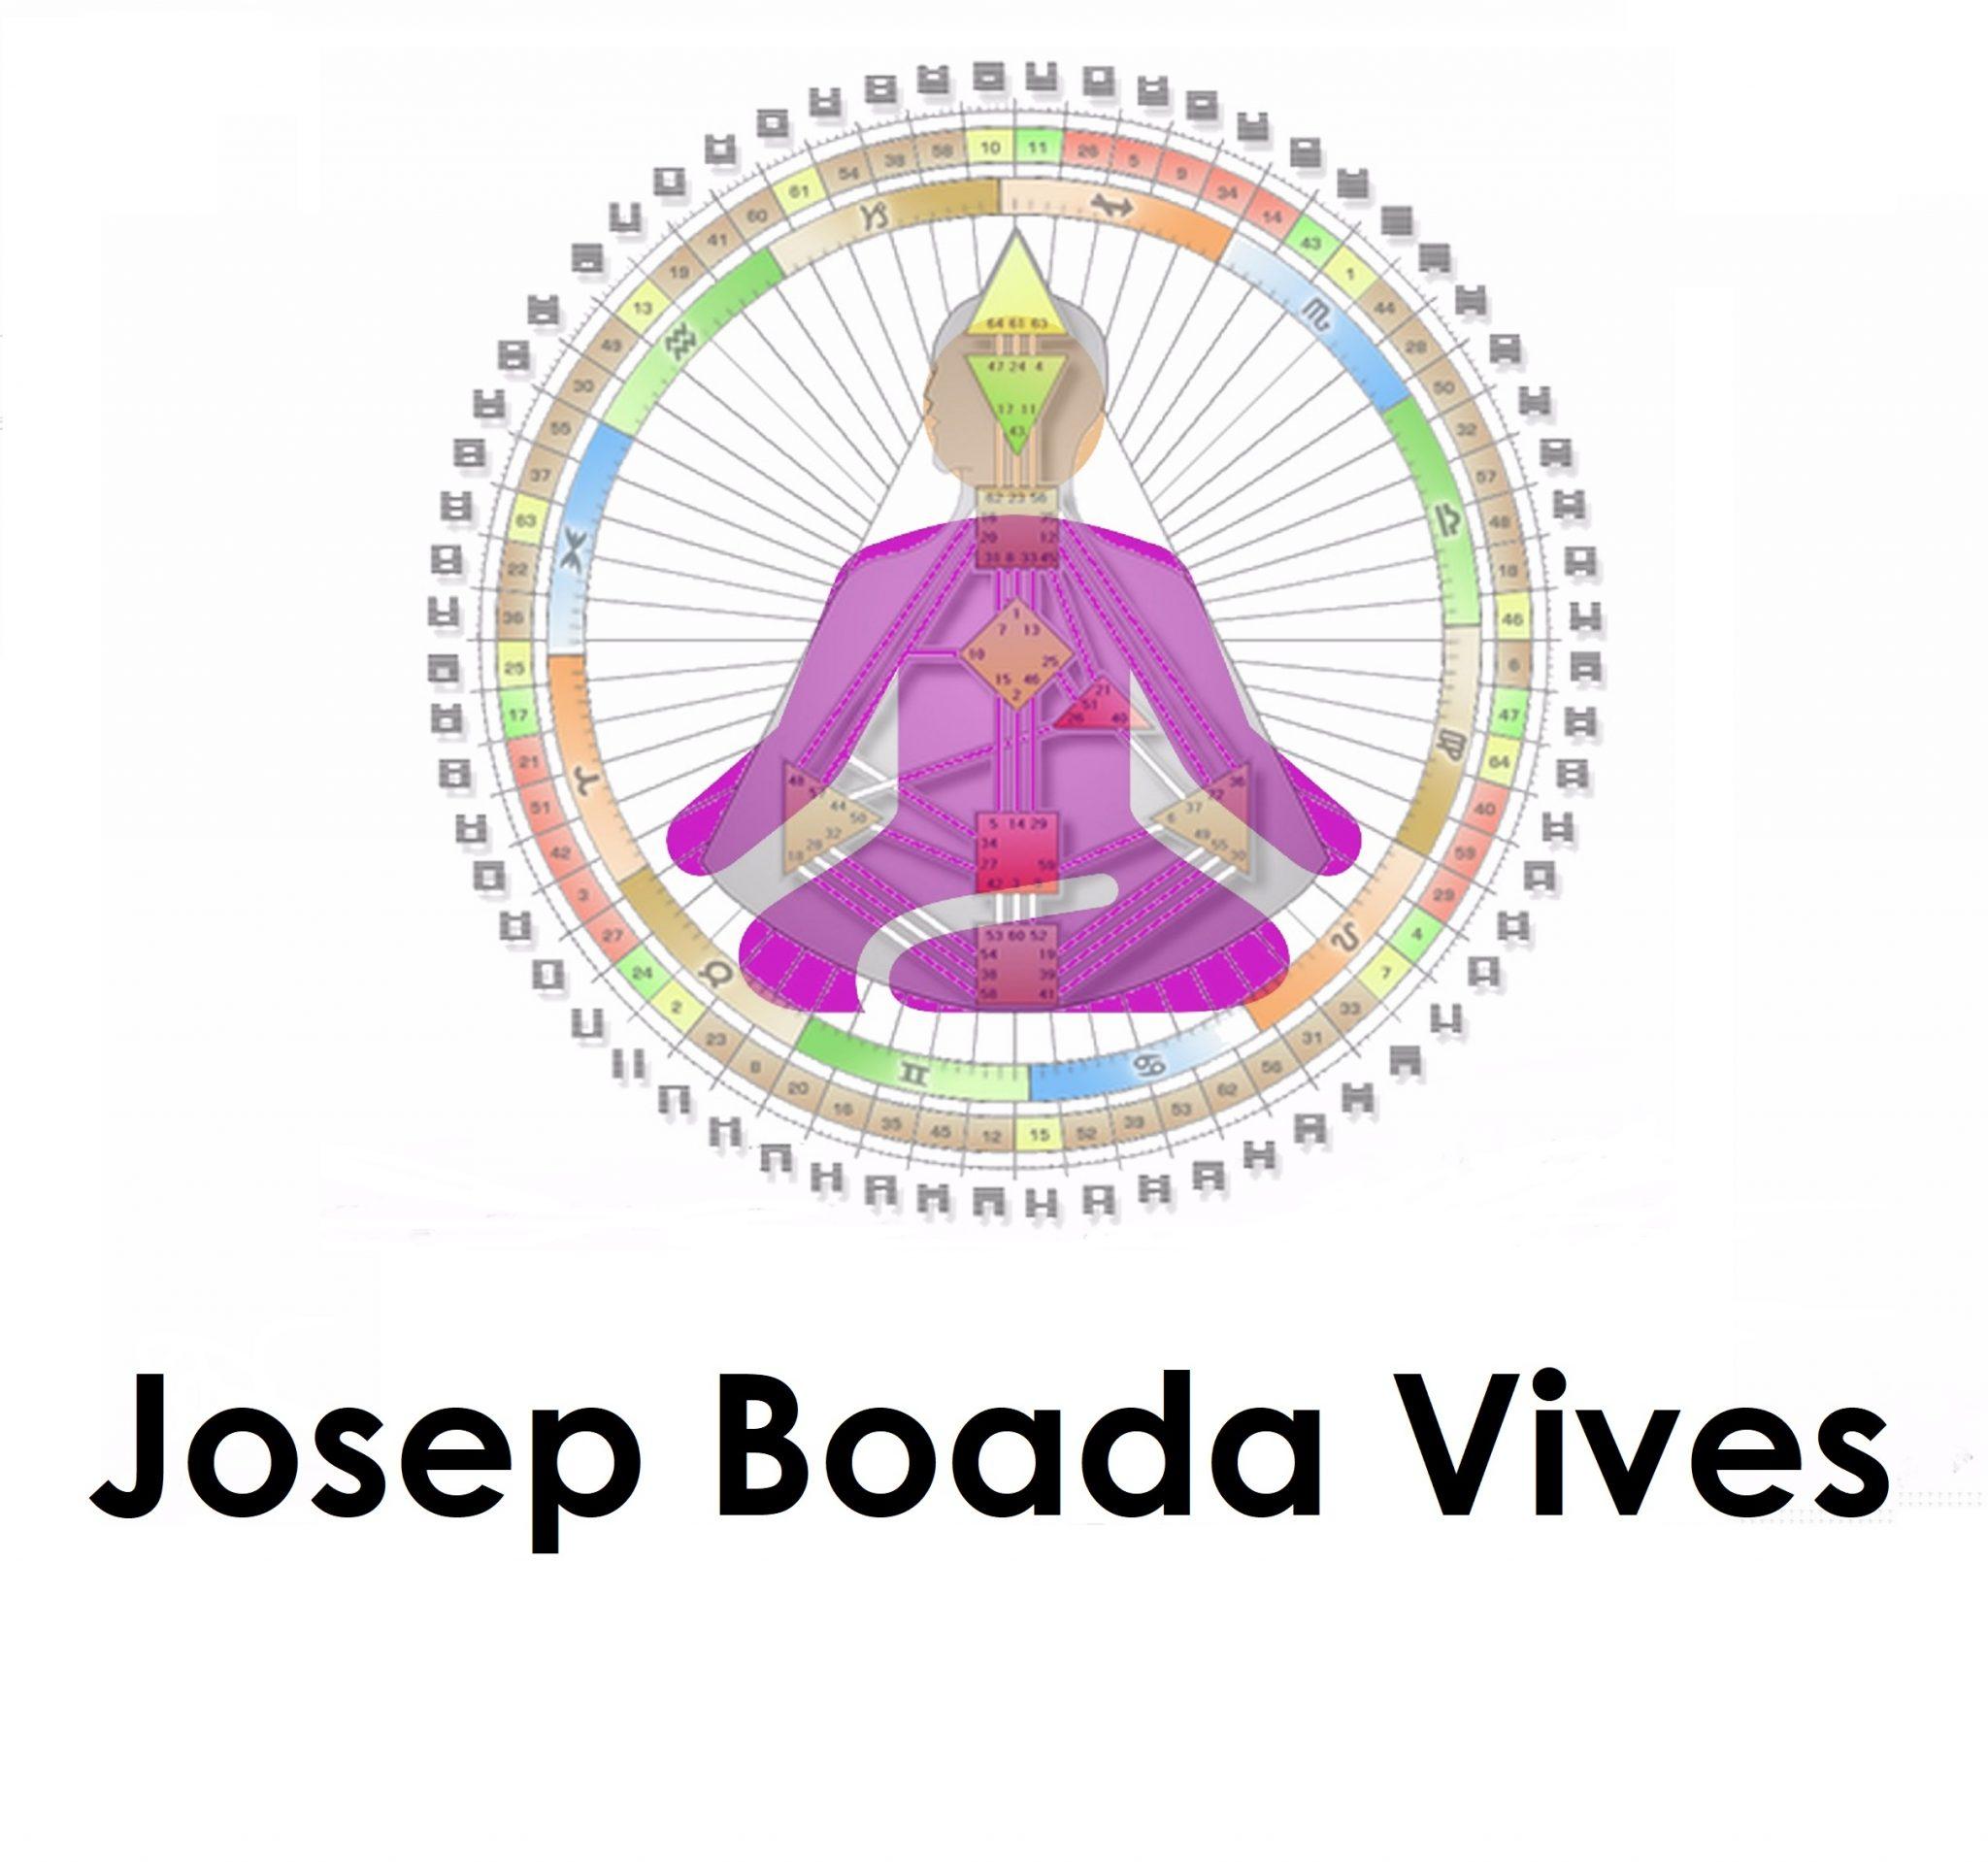 Josep Boada Vives - Dise